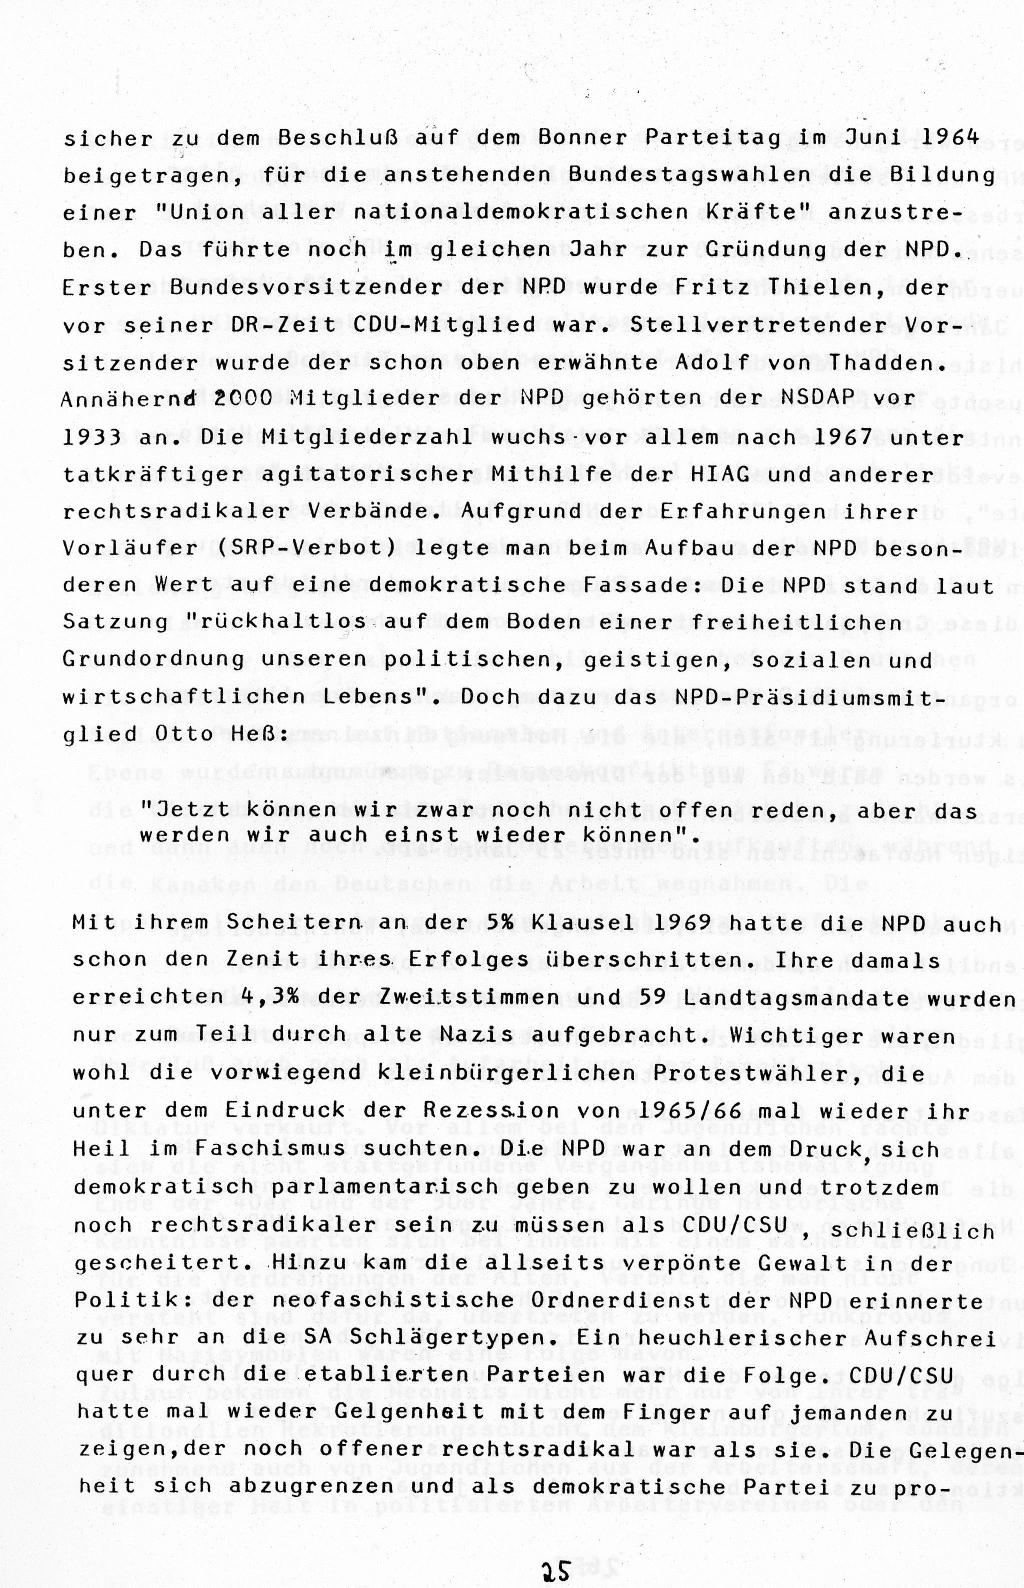 Berlin_1983_Autonome_Gruppen_Faschismus_im_Kapitalismus_25